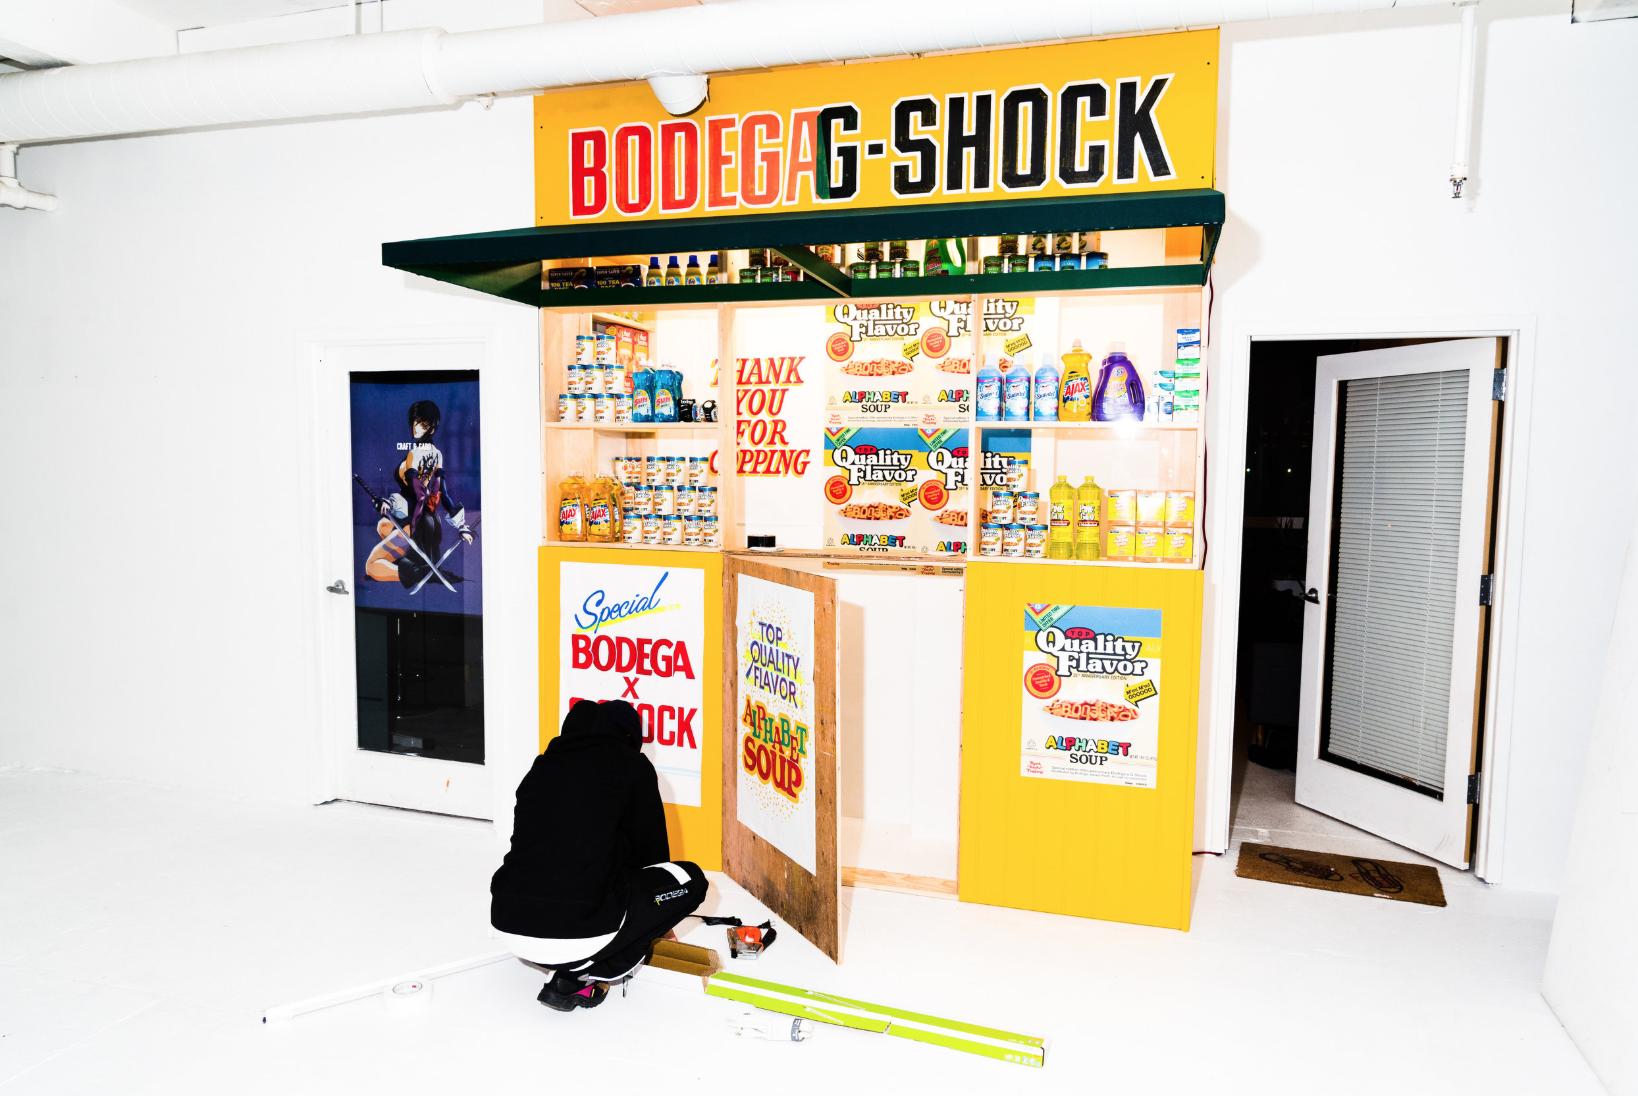 Bodega X G-Shock event, shot by Malakhai